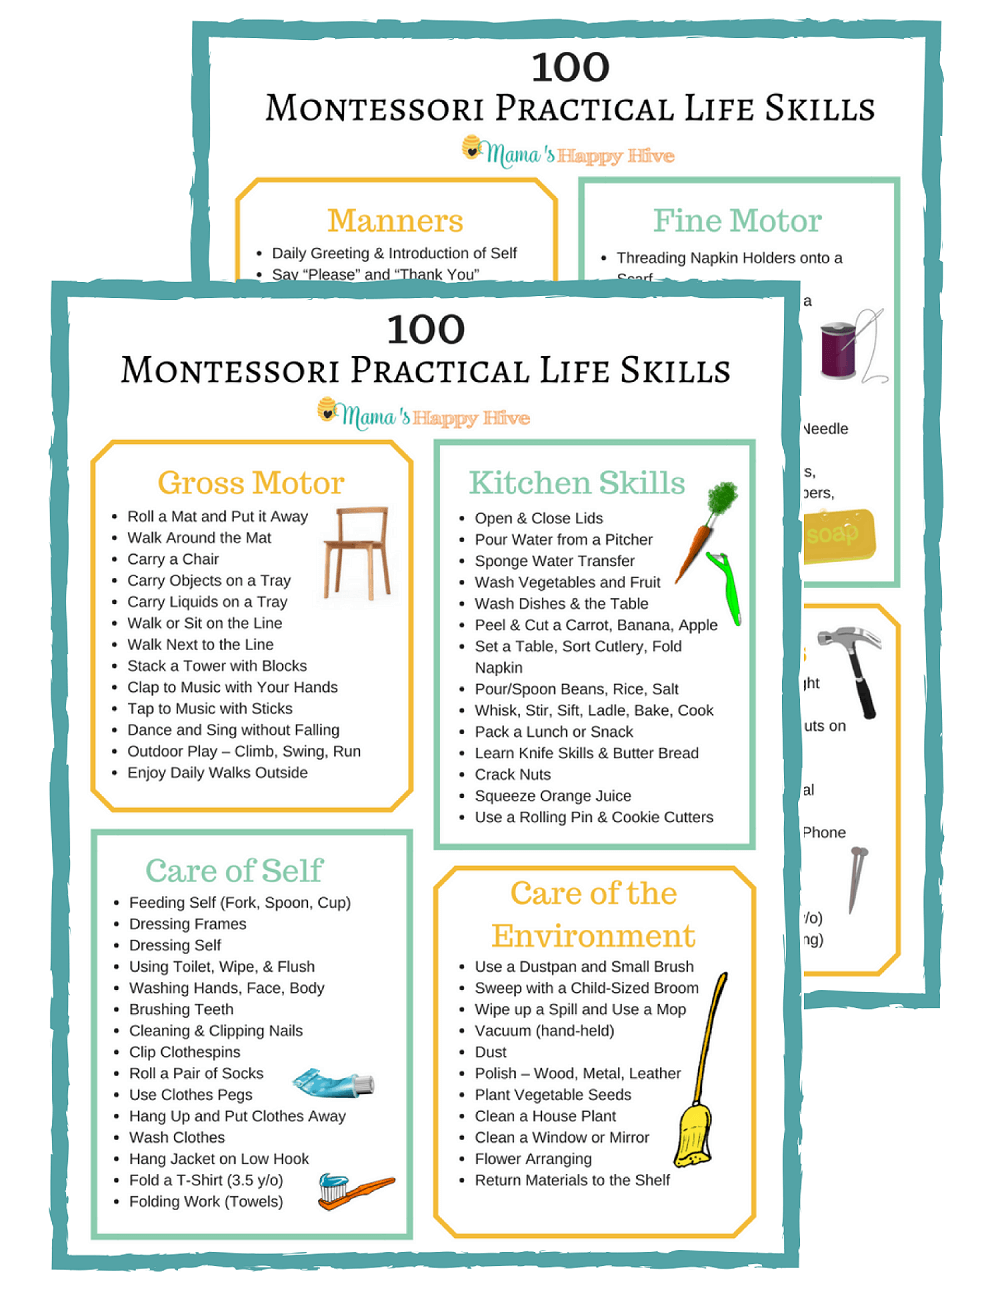 100 Montessori Practical Life Skills List